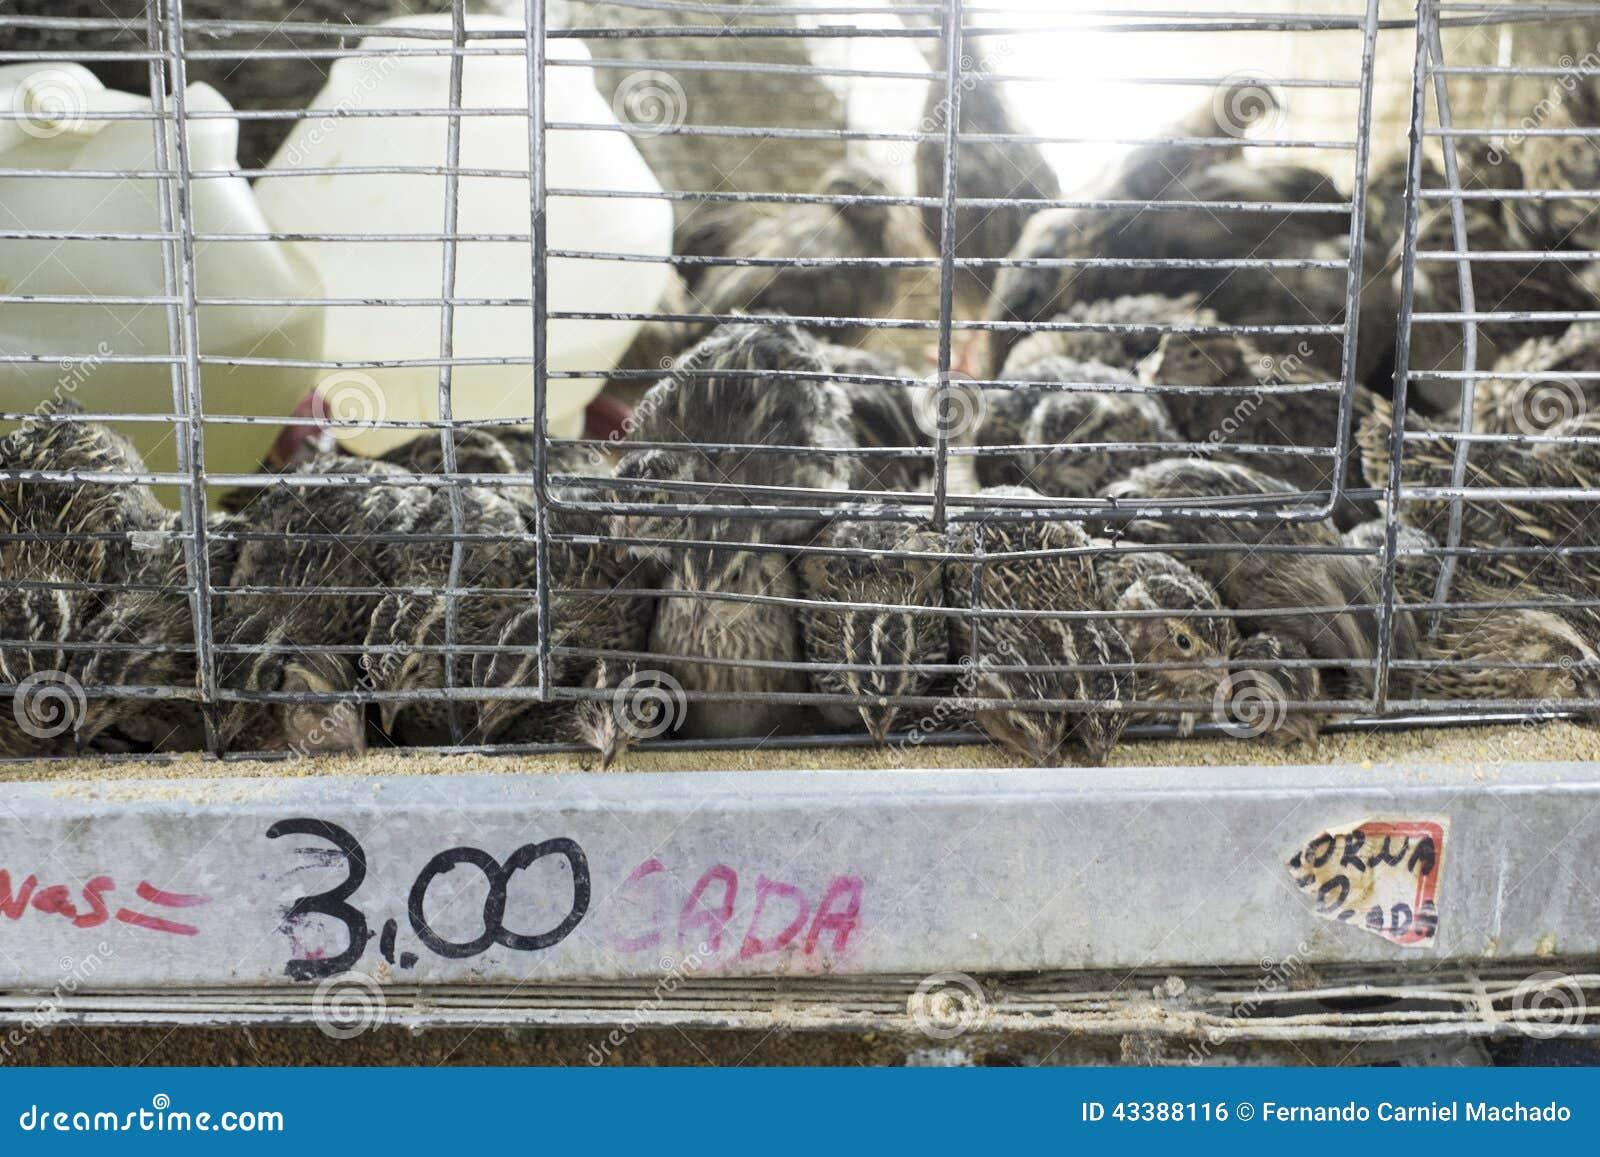 cailles dans les cages vendre photo stock image 43388116. Black Bedroom Furniture Sets. Home Design Ideas